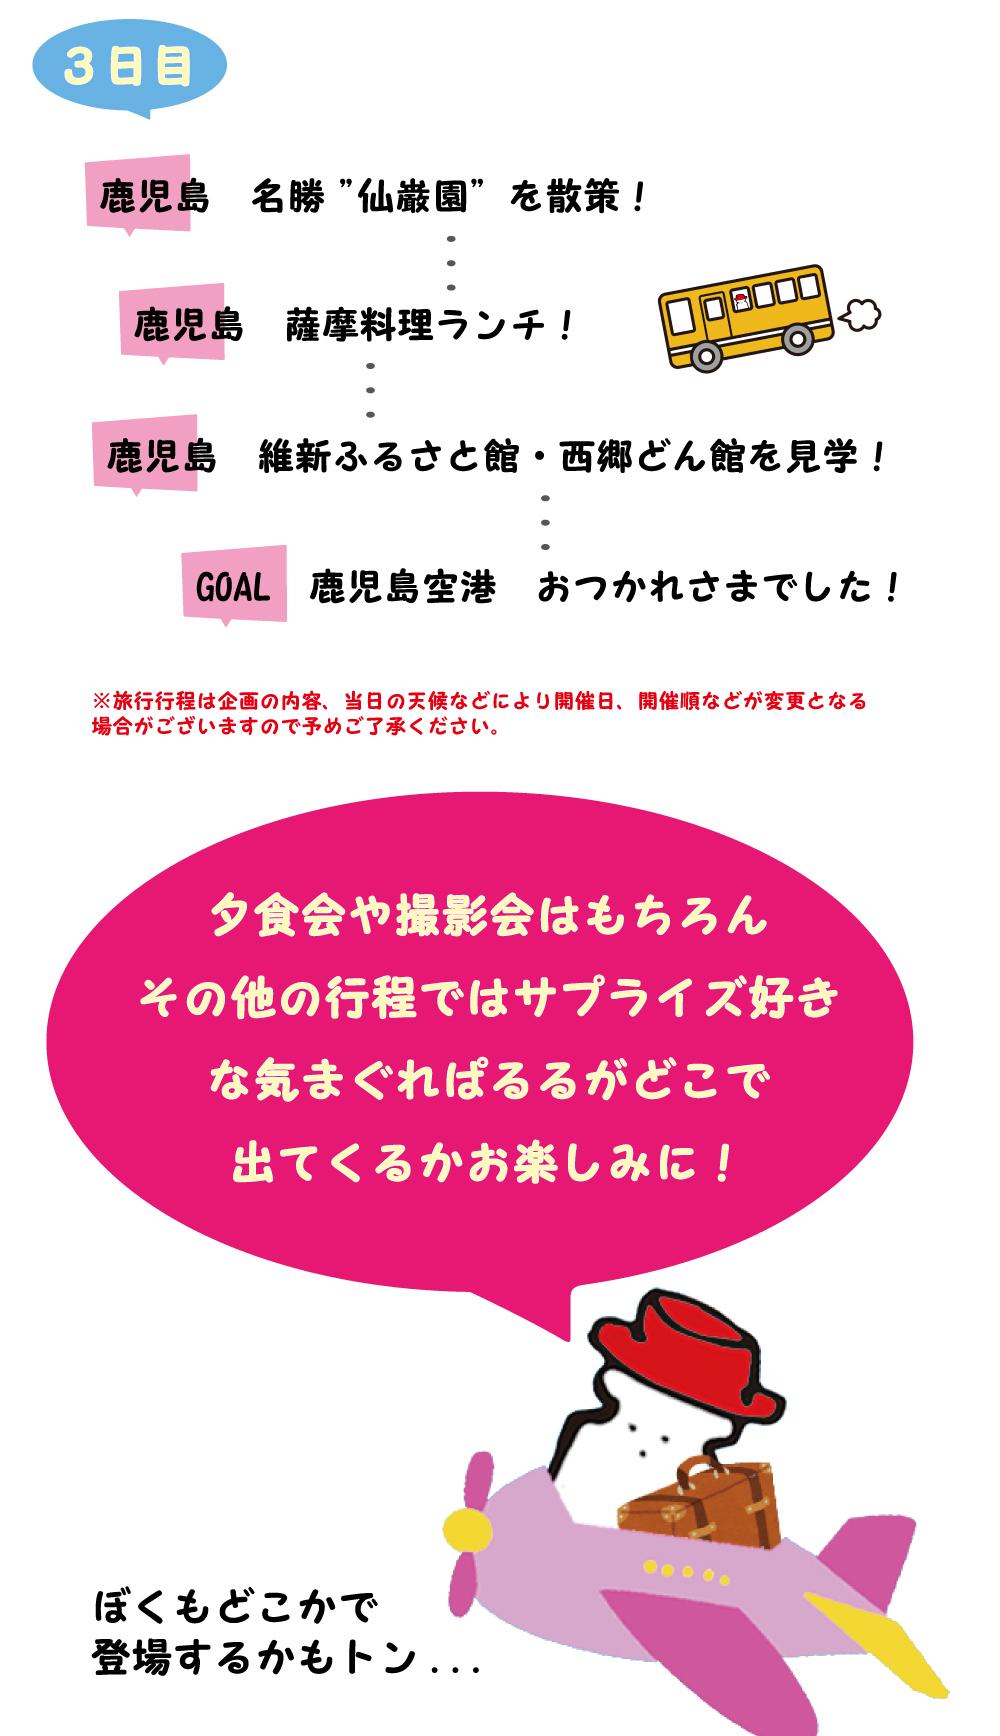 http://shimazakiharuka.com/s3/skiyaki/uploads/ckeditor/pictures/175734/content_%E3%83%84%E3%82%A2%E3%83%BC%E8%A9%B3%E7%B4%B02.jpg